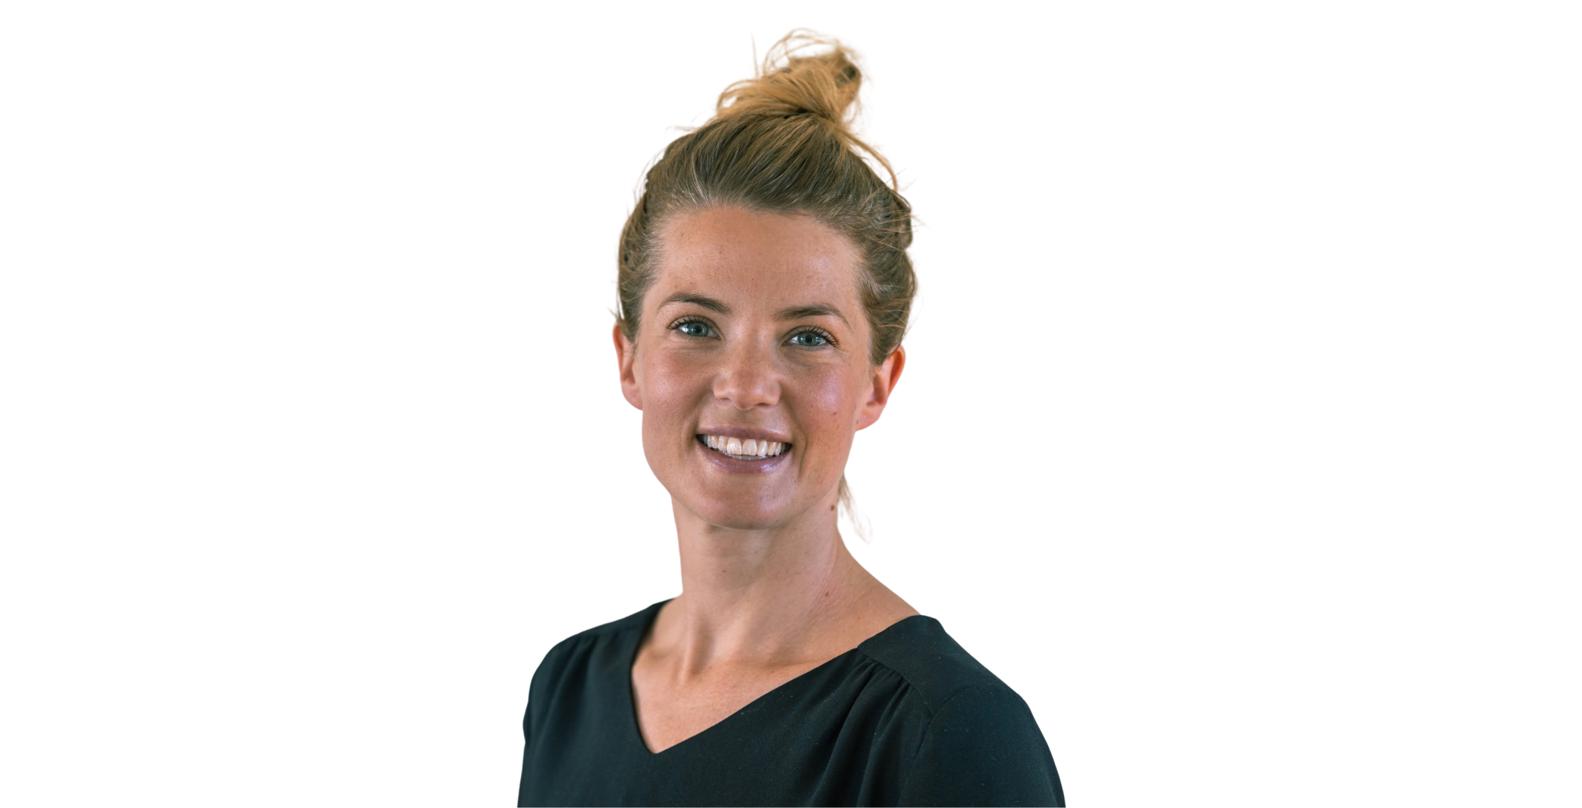 Profilbild Mille Söderberg